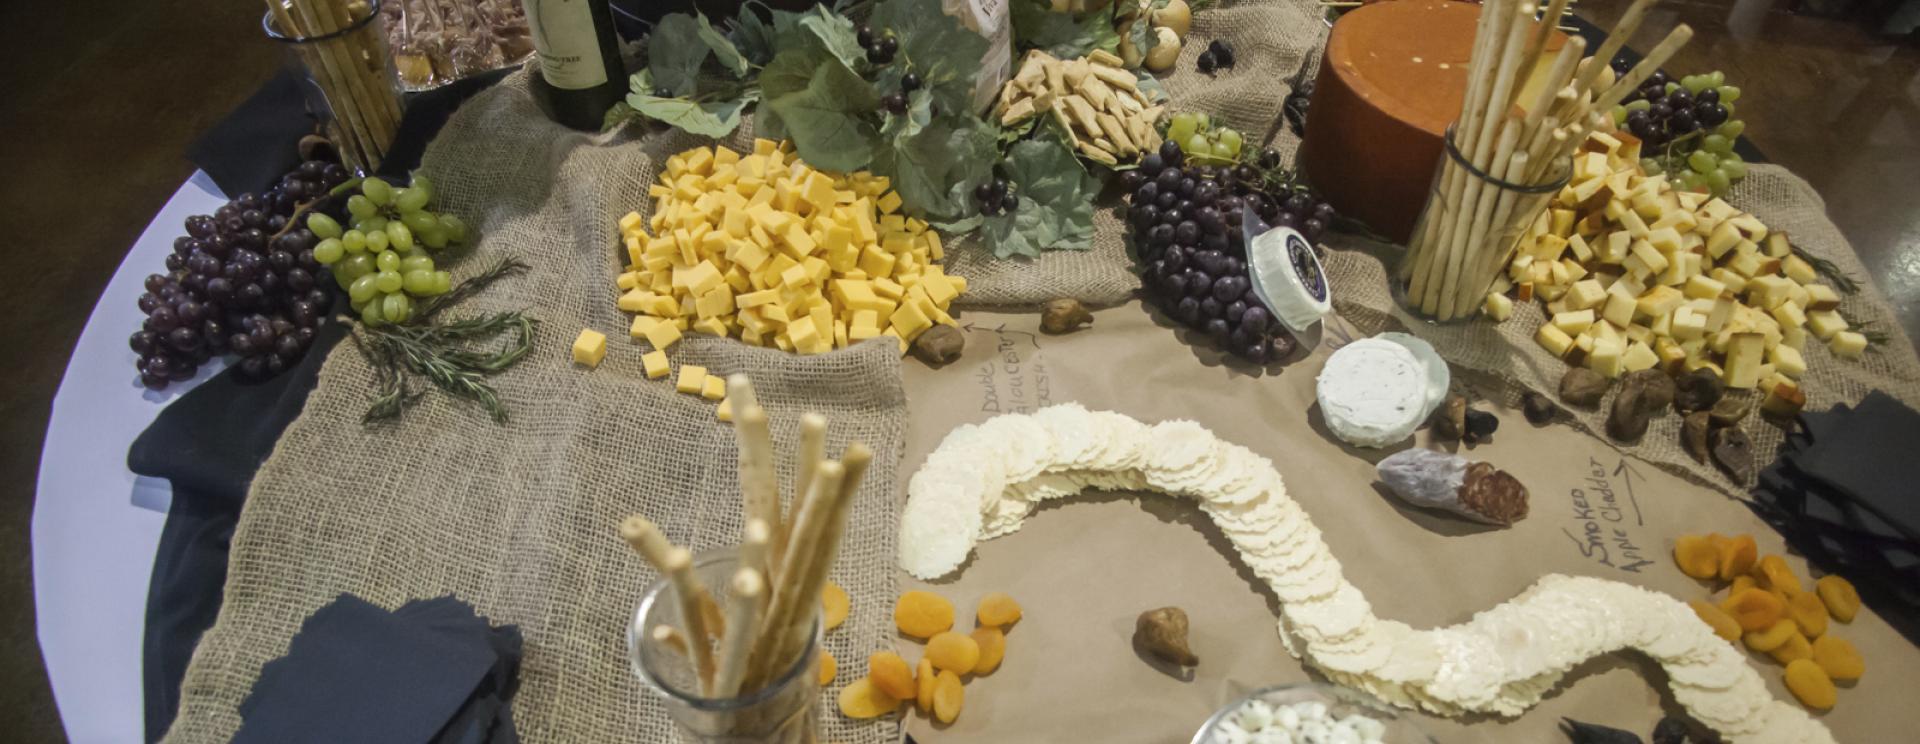 Forks, Corks, & Kegs: Food & Wine Festival